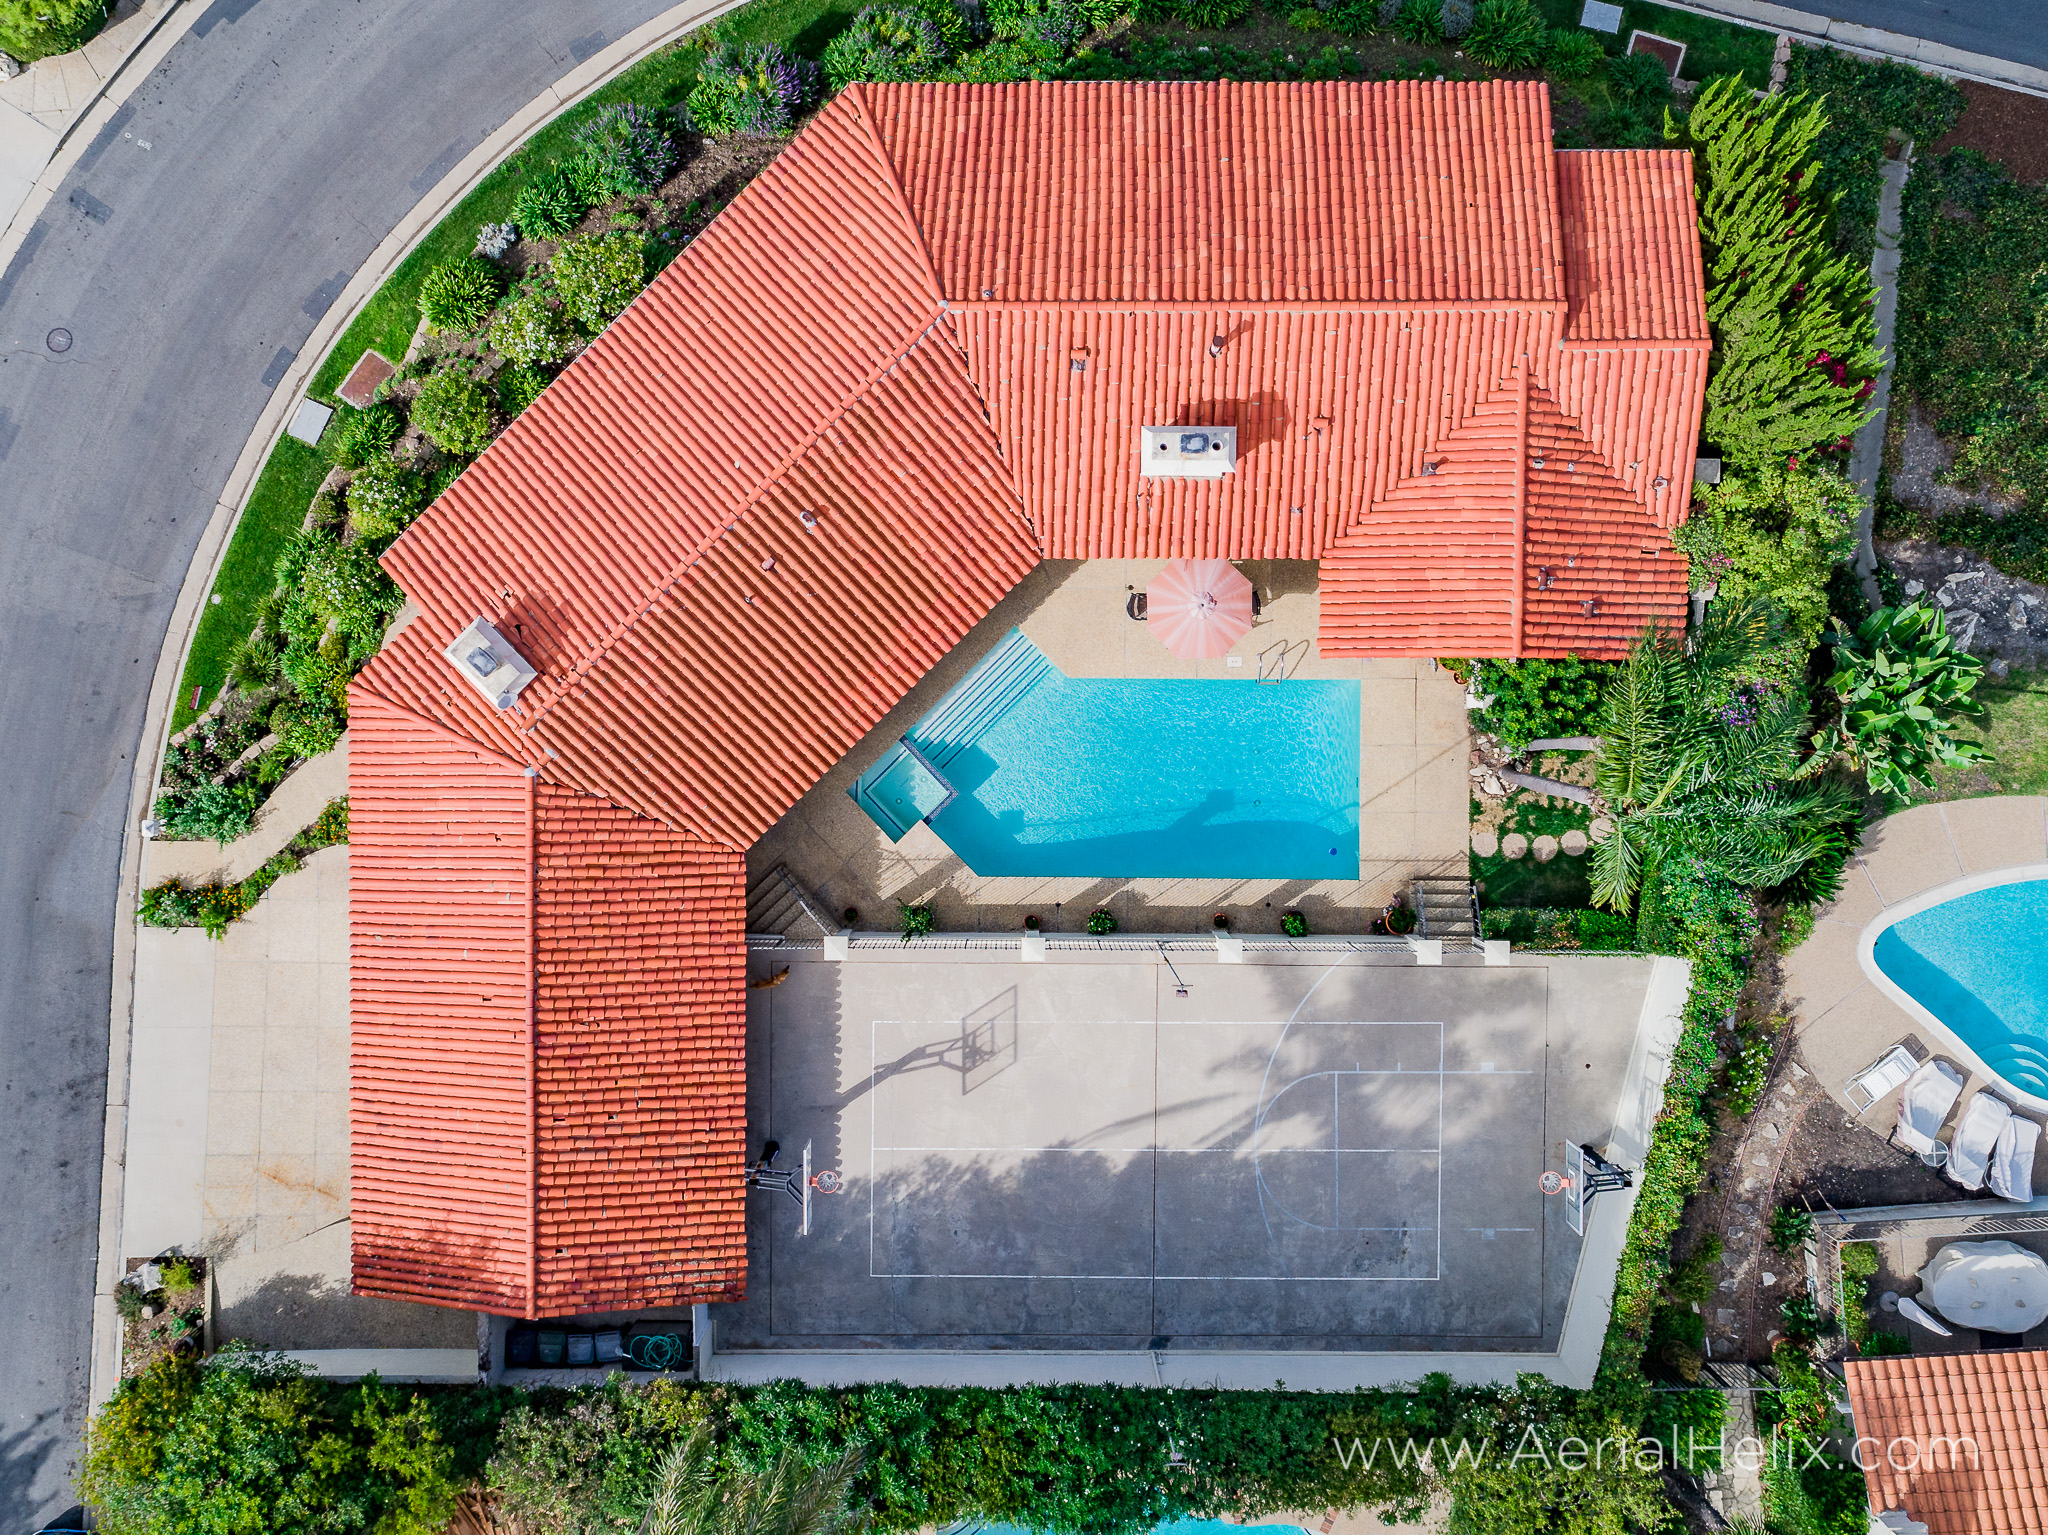 Woodfern Drive - HELIX Real Estate Aerial Photographer-4.jpg